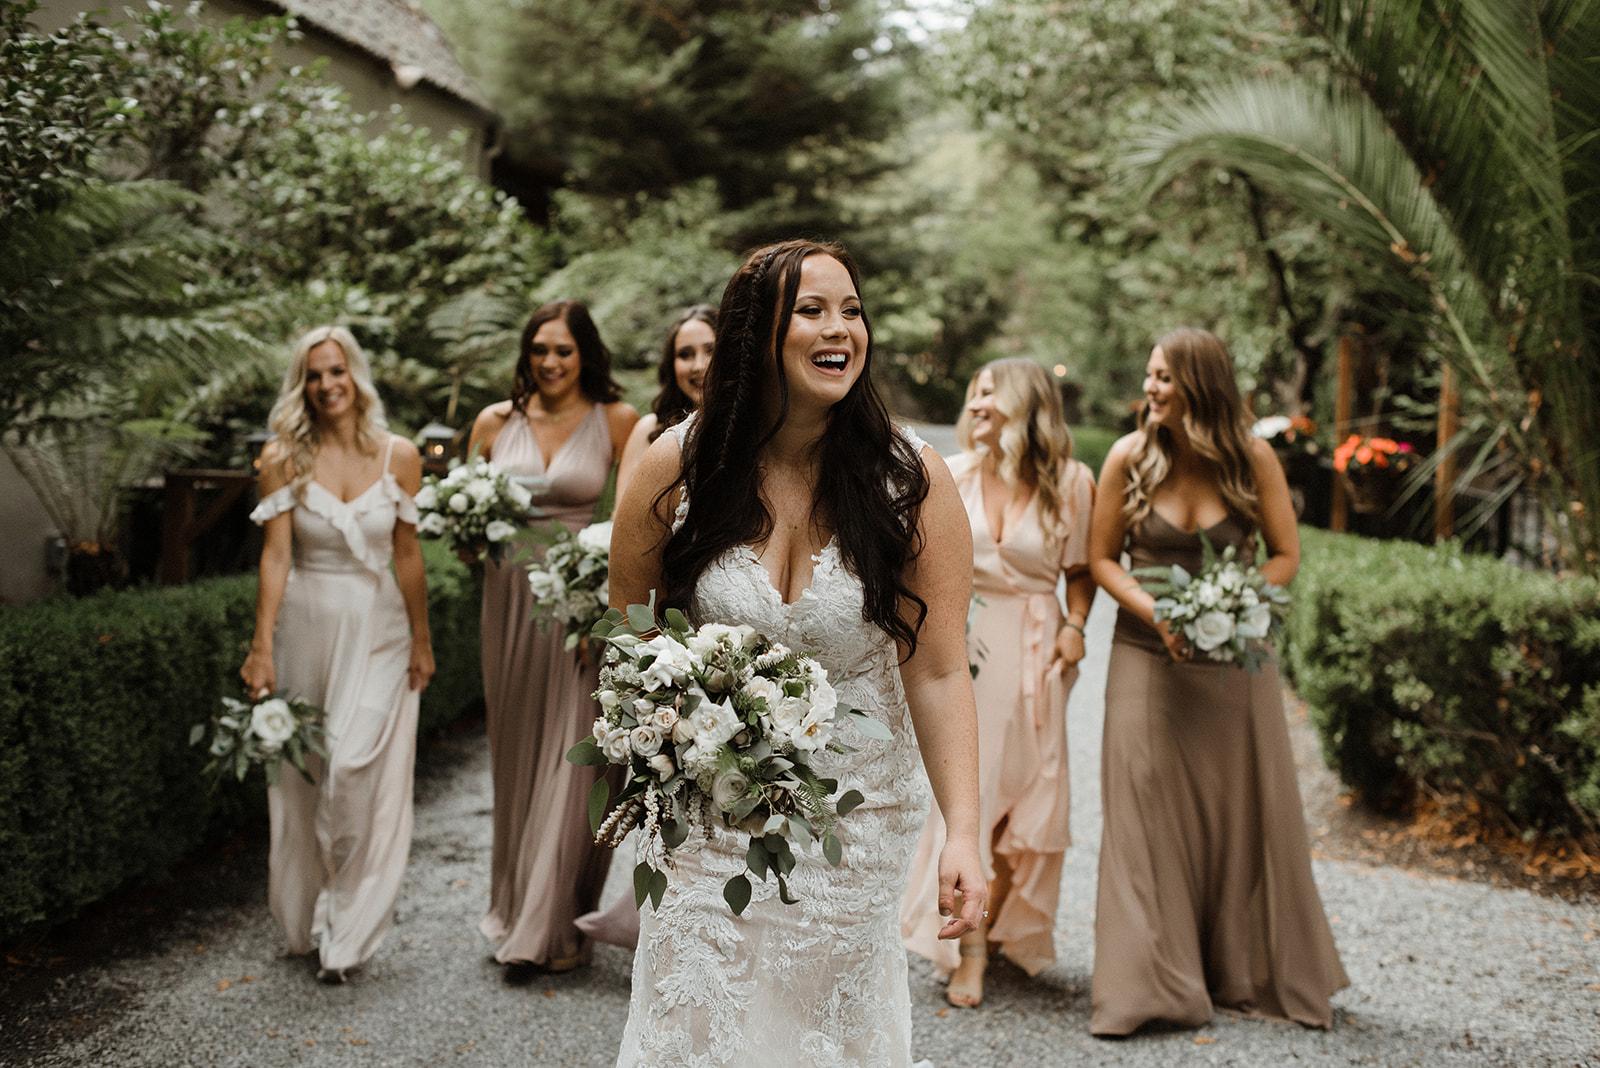 berger-wedding-169.jpg